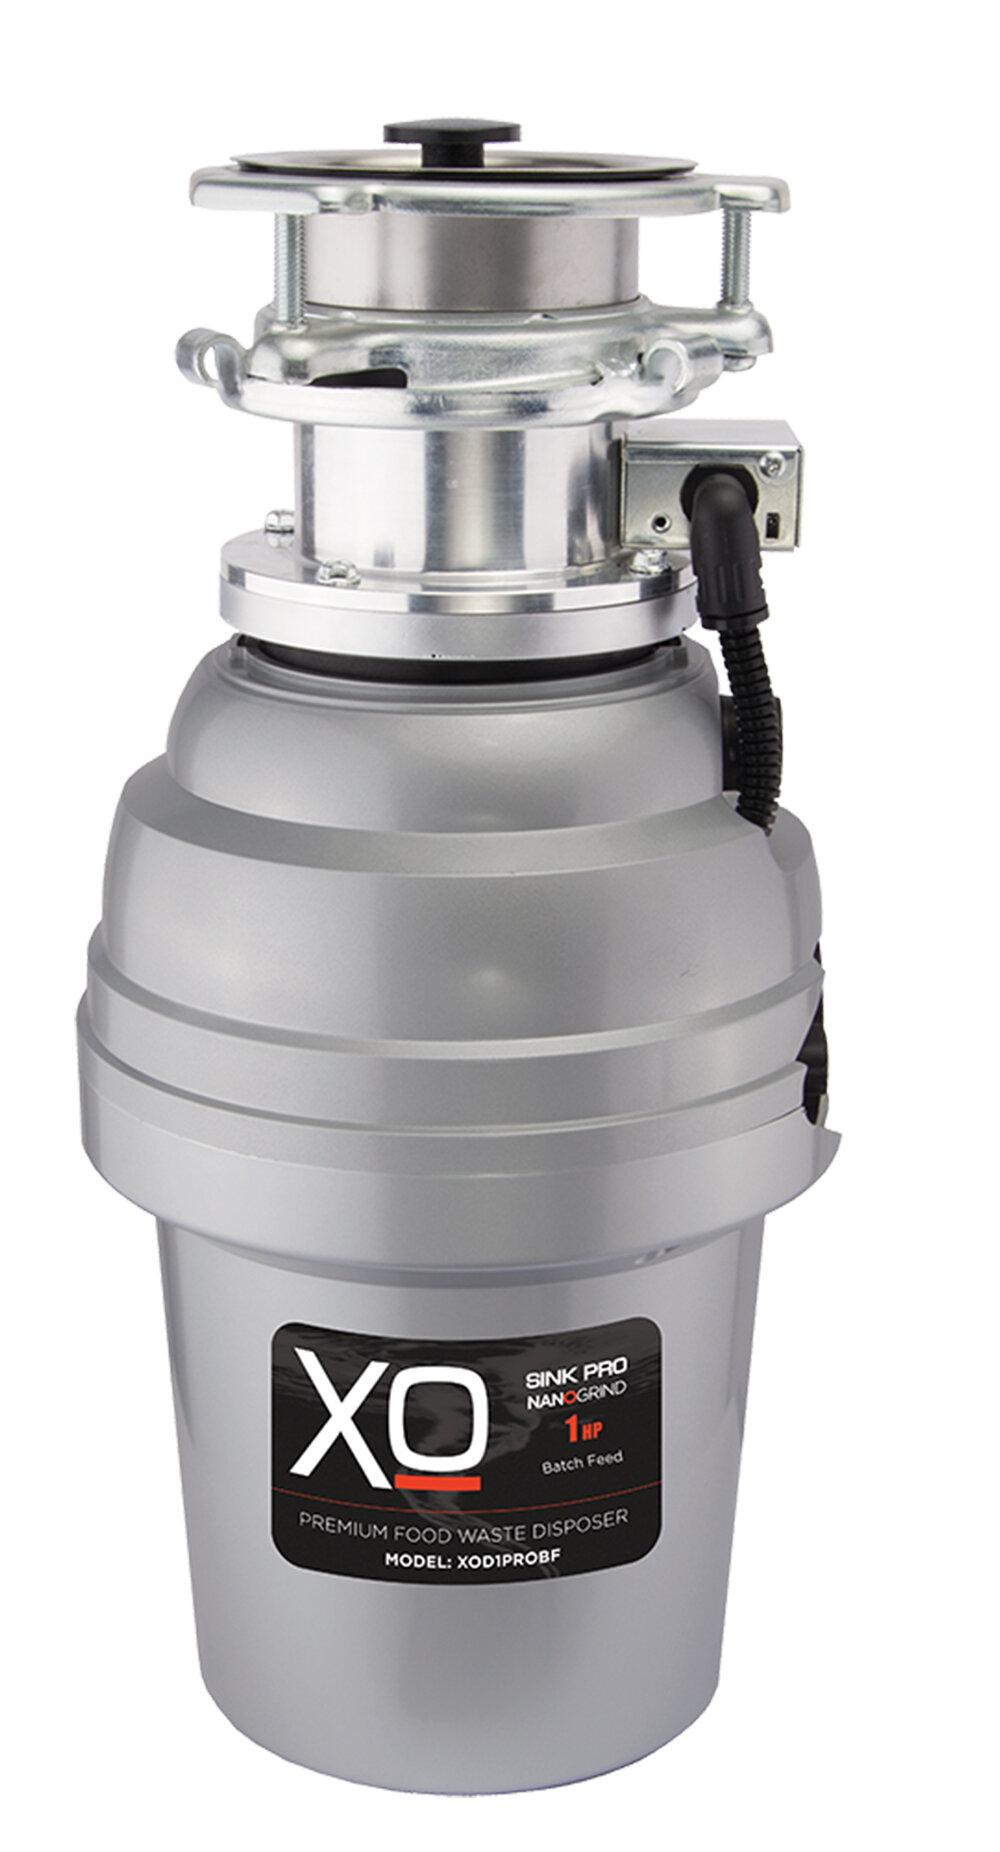 Xo Appliance 1 Hp Batch Feed Garbage Disposal Wayfair